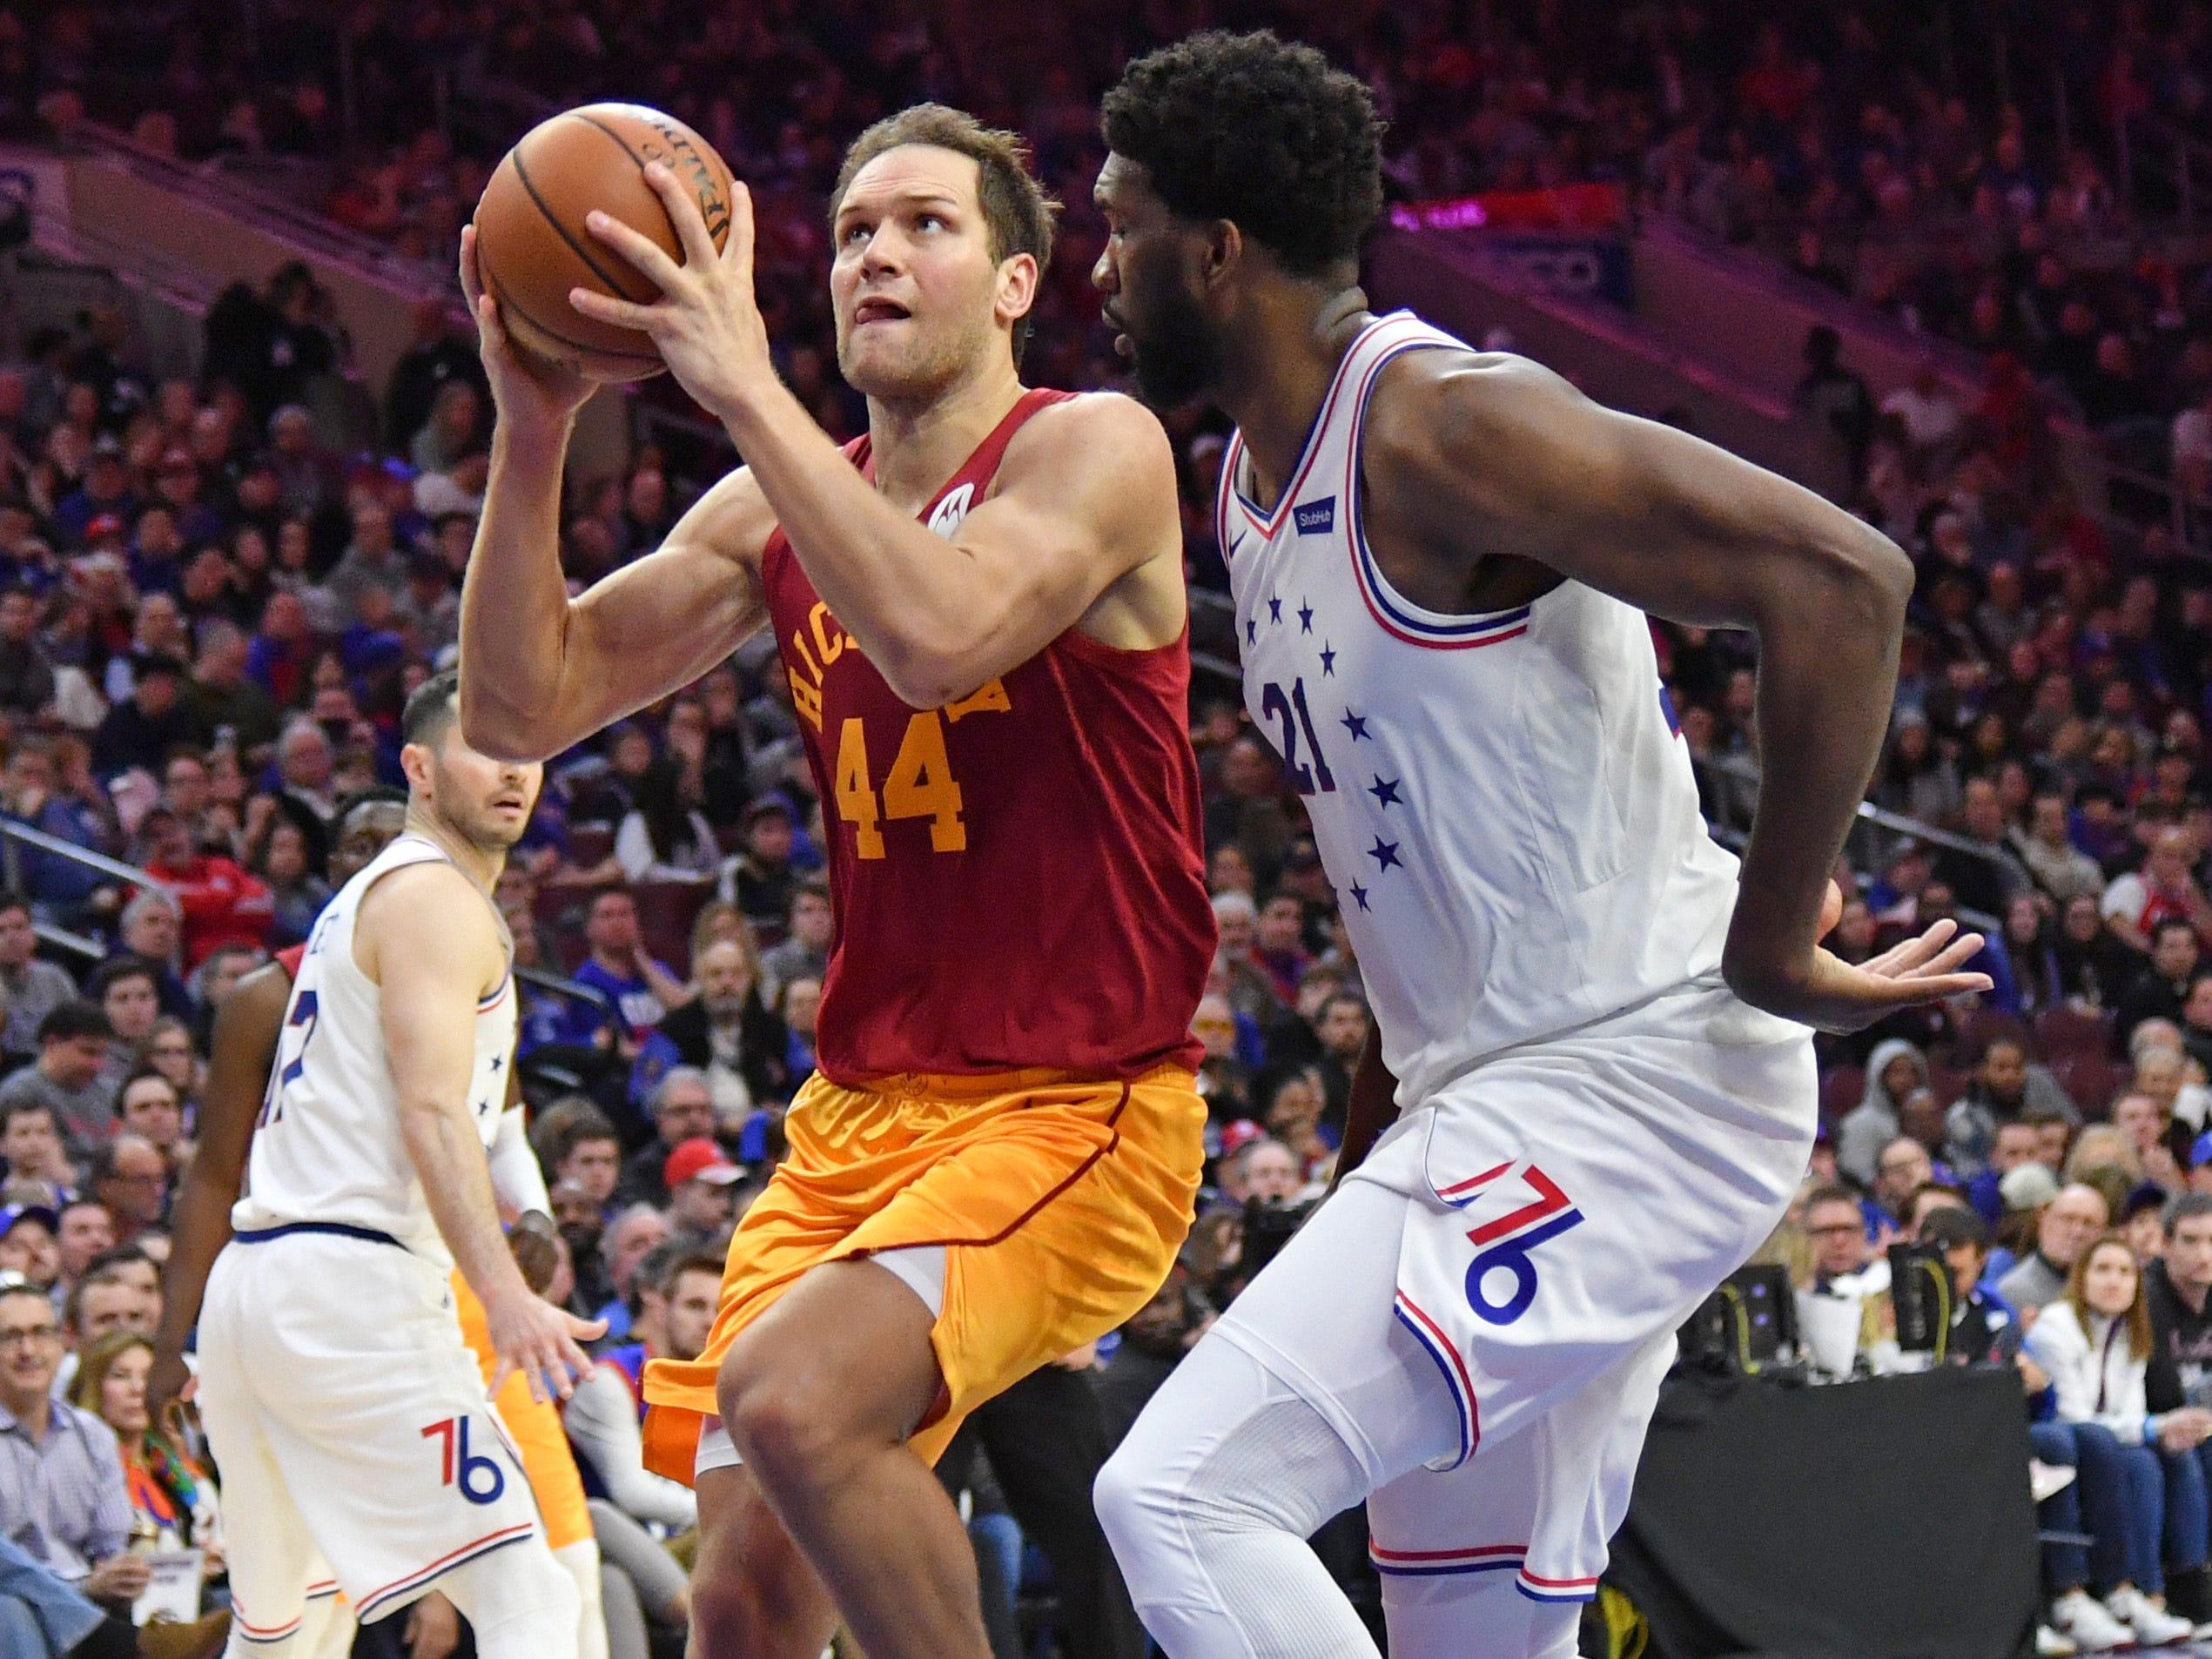 Mar 10, 2019; Philadelphia, PA, USA; Indiana Pacers forward Bojan Bogdanovic (44) drives to the basket against Philadelphia 76ers center Joel Embiid (21) during the second quarter at Wells Fargo Center.